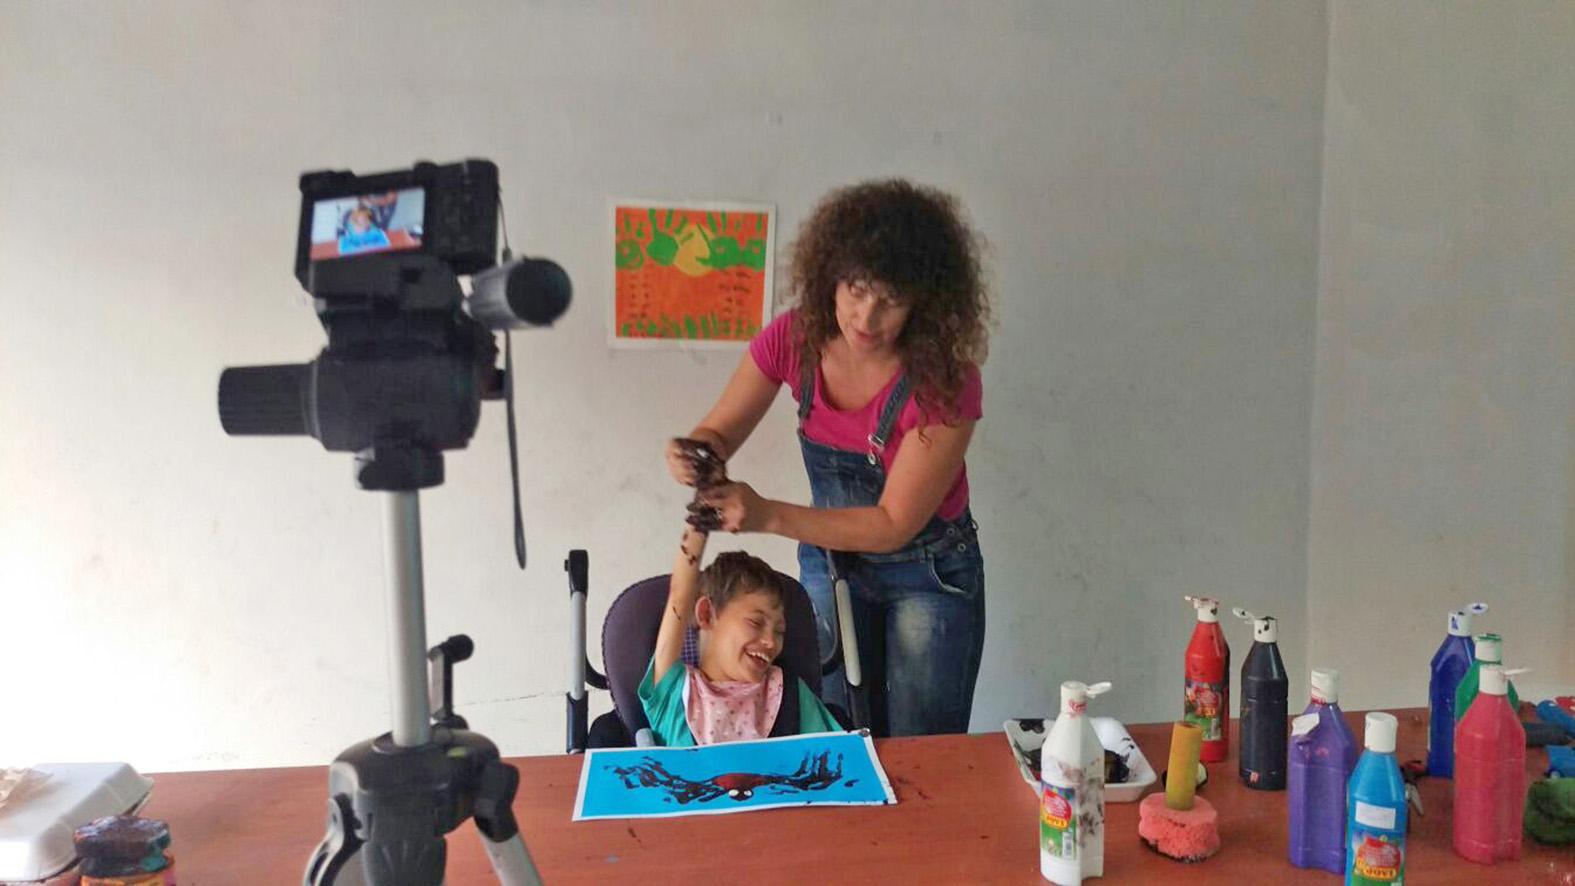 Canal de TV Marta Ferreras